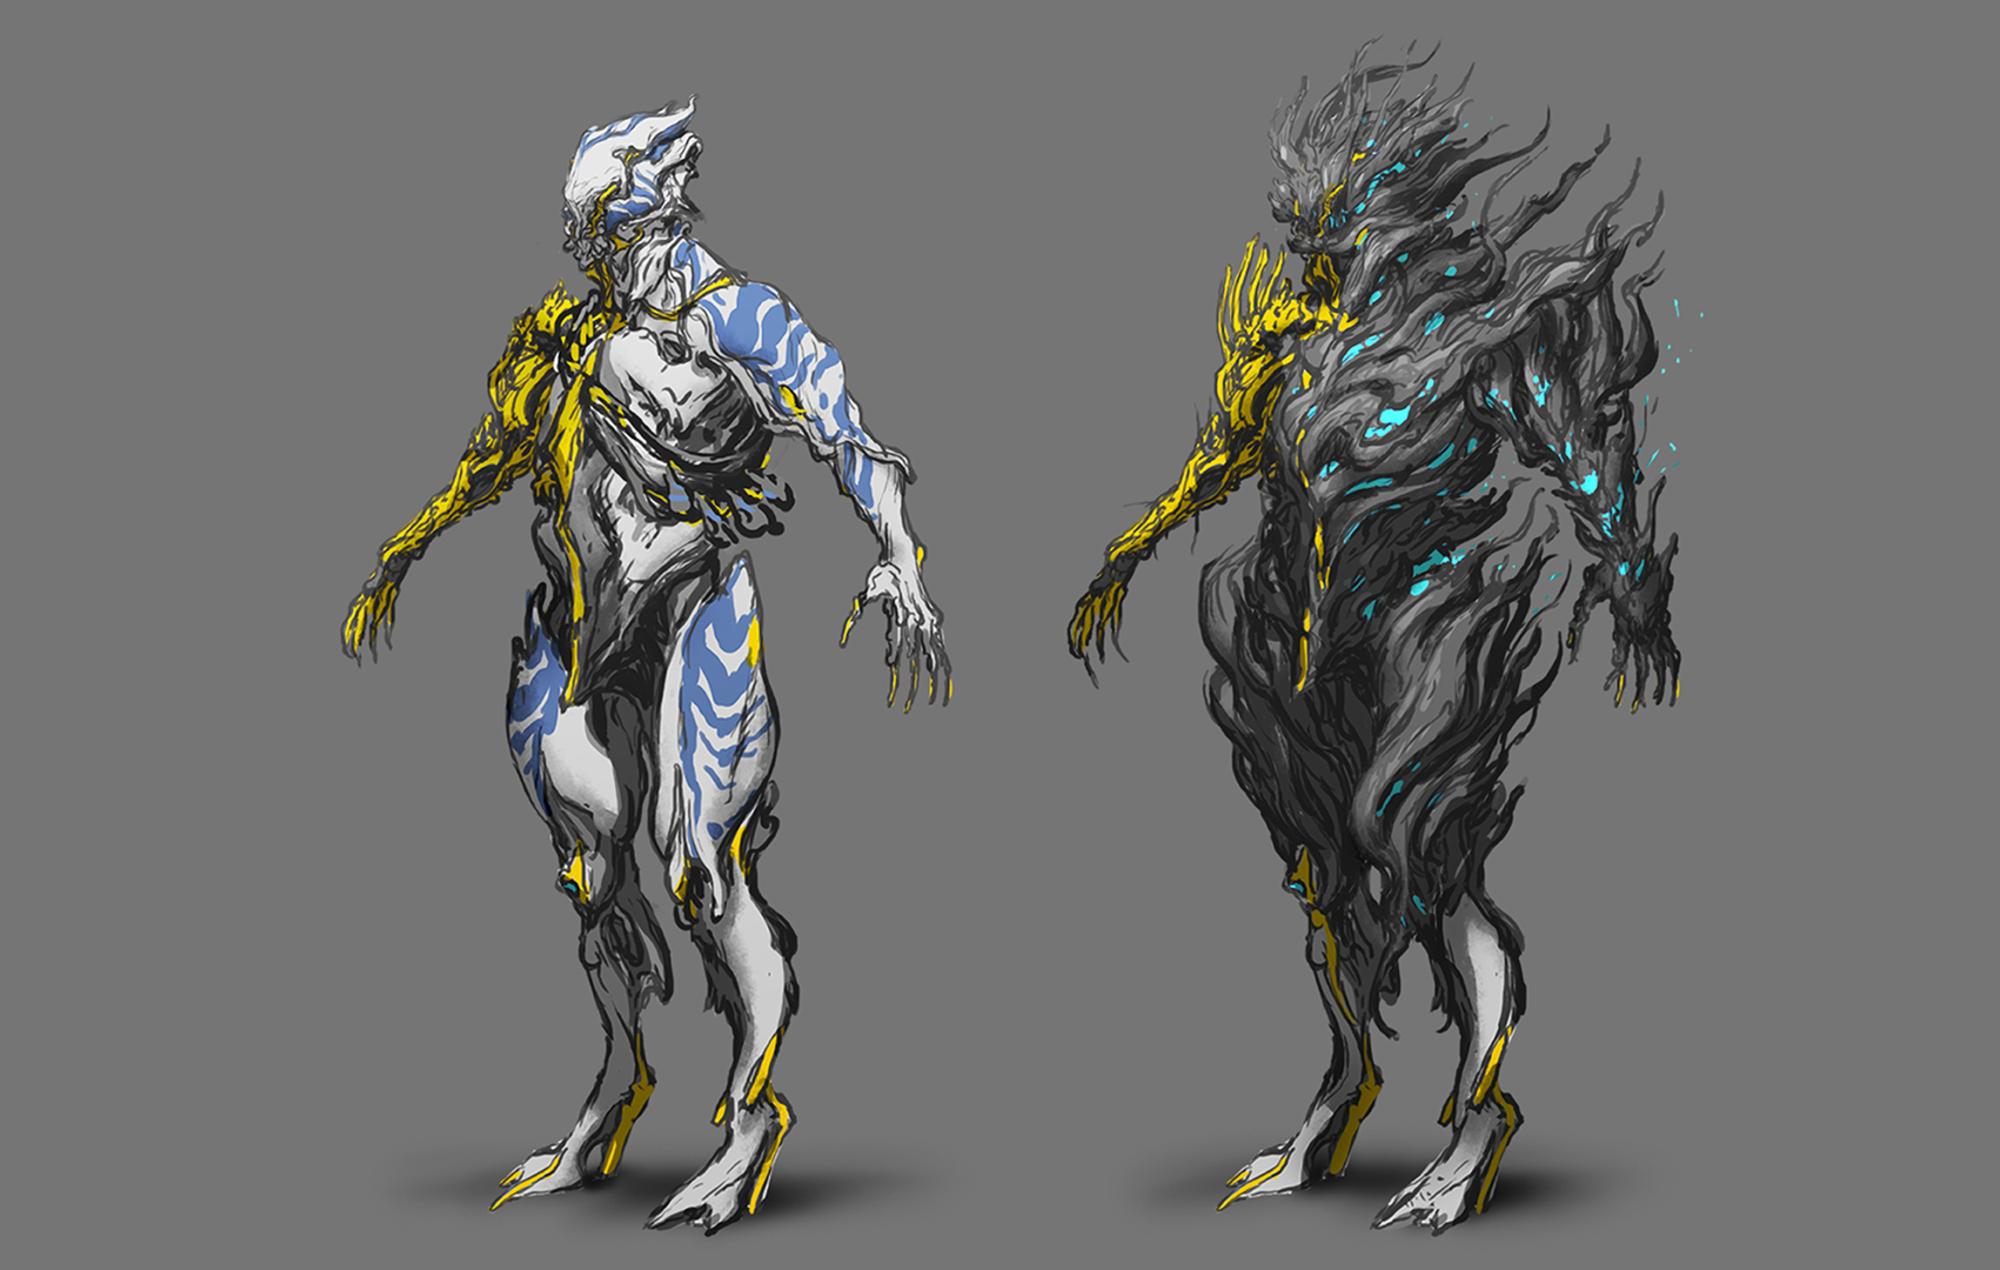 Warframe nidus prime concept art